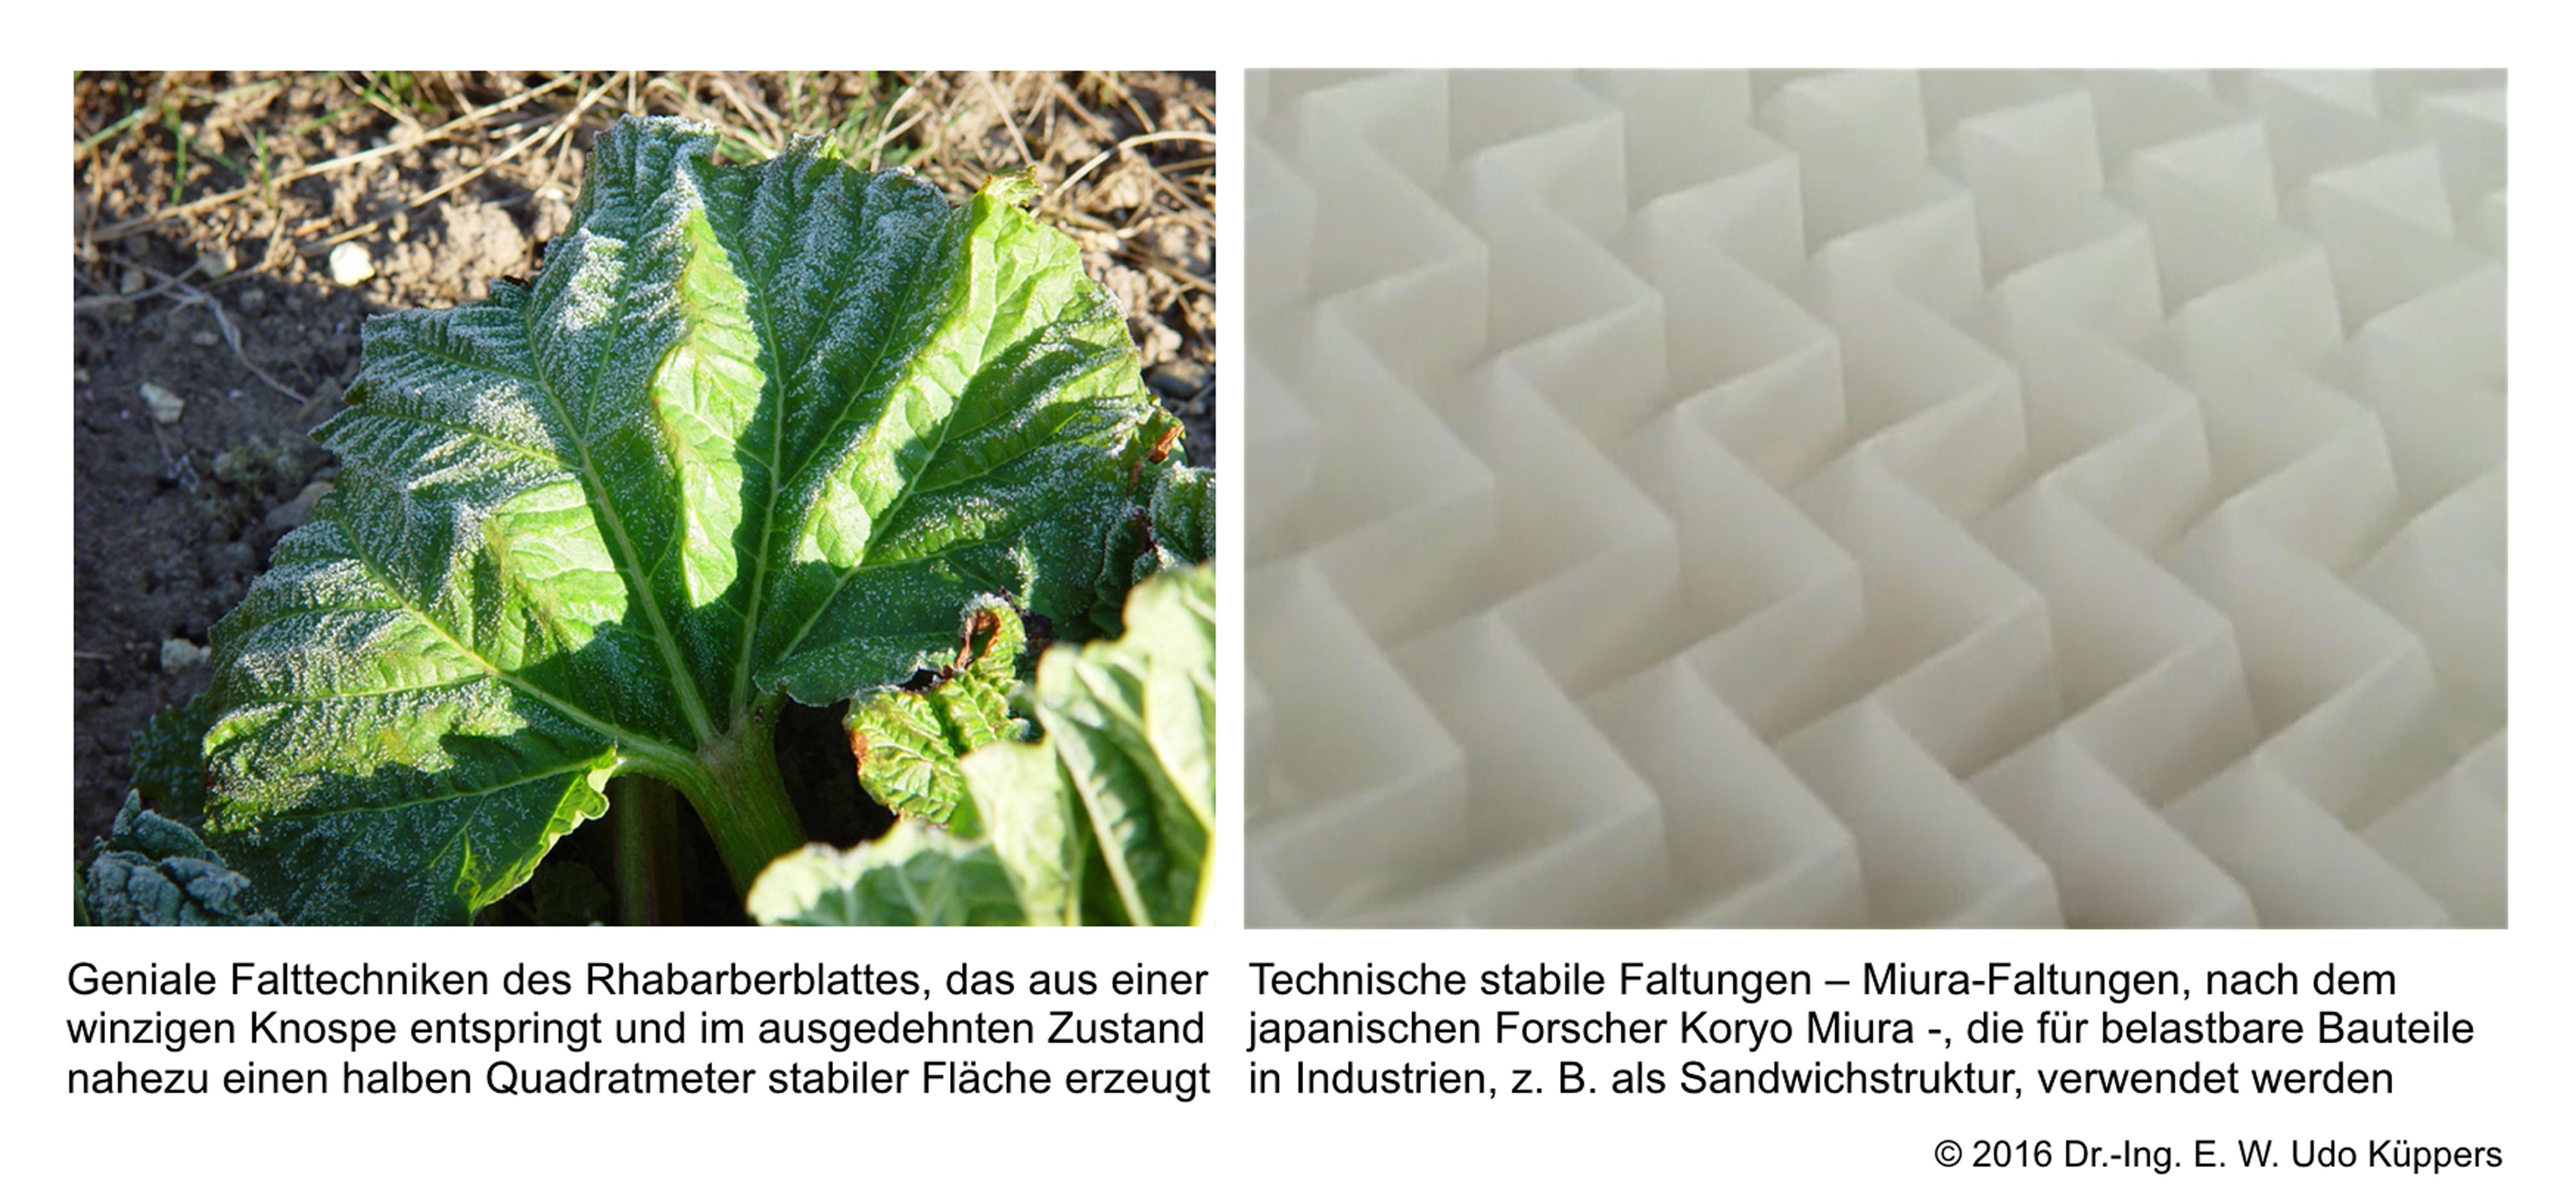 abb-5-rharbarberblatt-miura-faltung-600pi